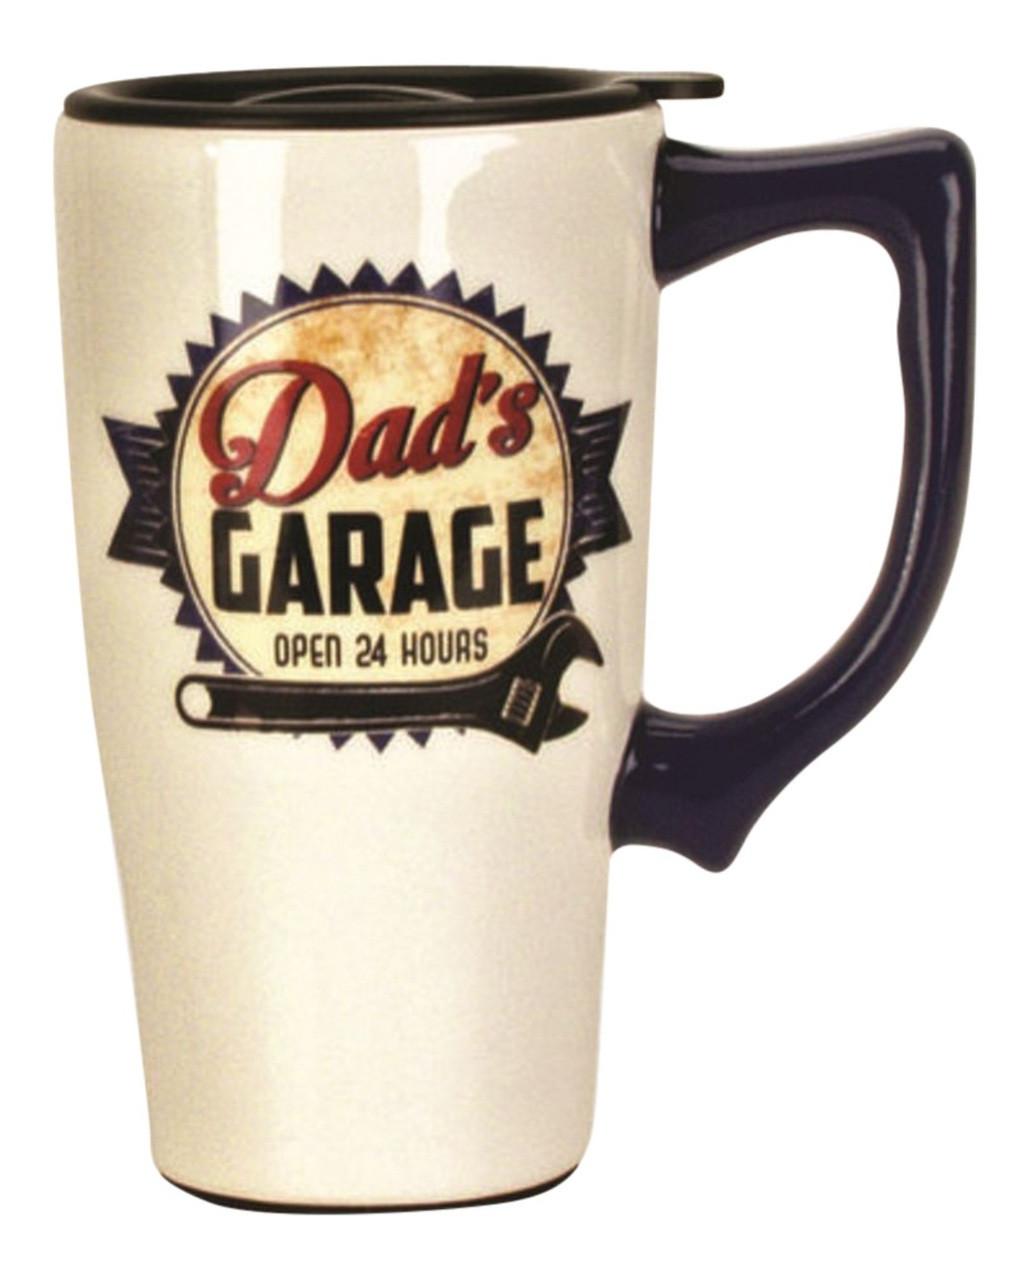 Dads Garage Open 24 Hours Ceramic Travel Mug With Lid 16